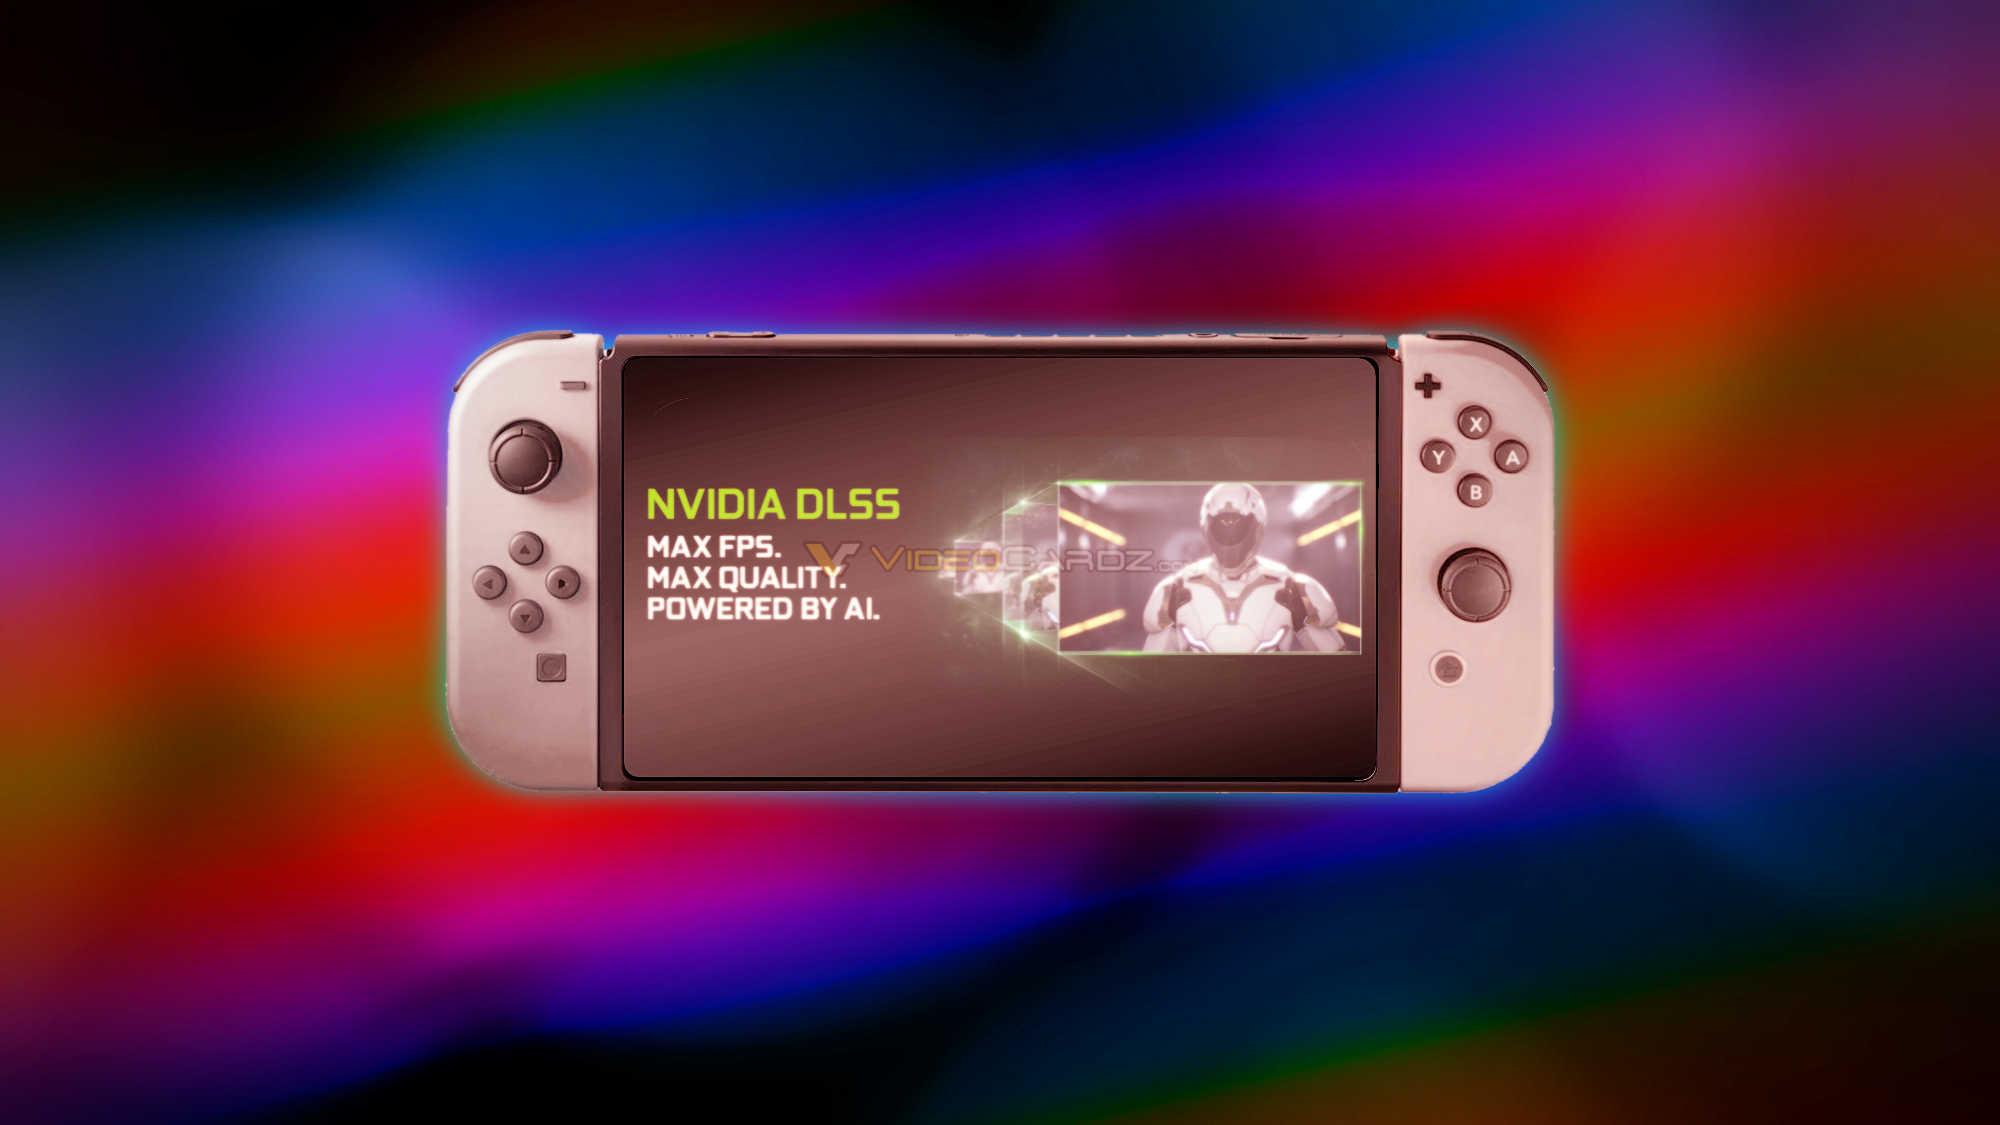 Next-Gen Nintendo Switch rumored to feature NVIDIA 'Ada Lovelace' GPU architecture – VideoCardz.com